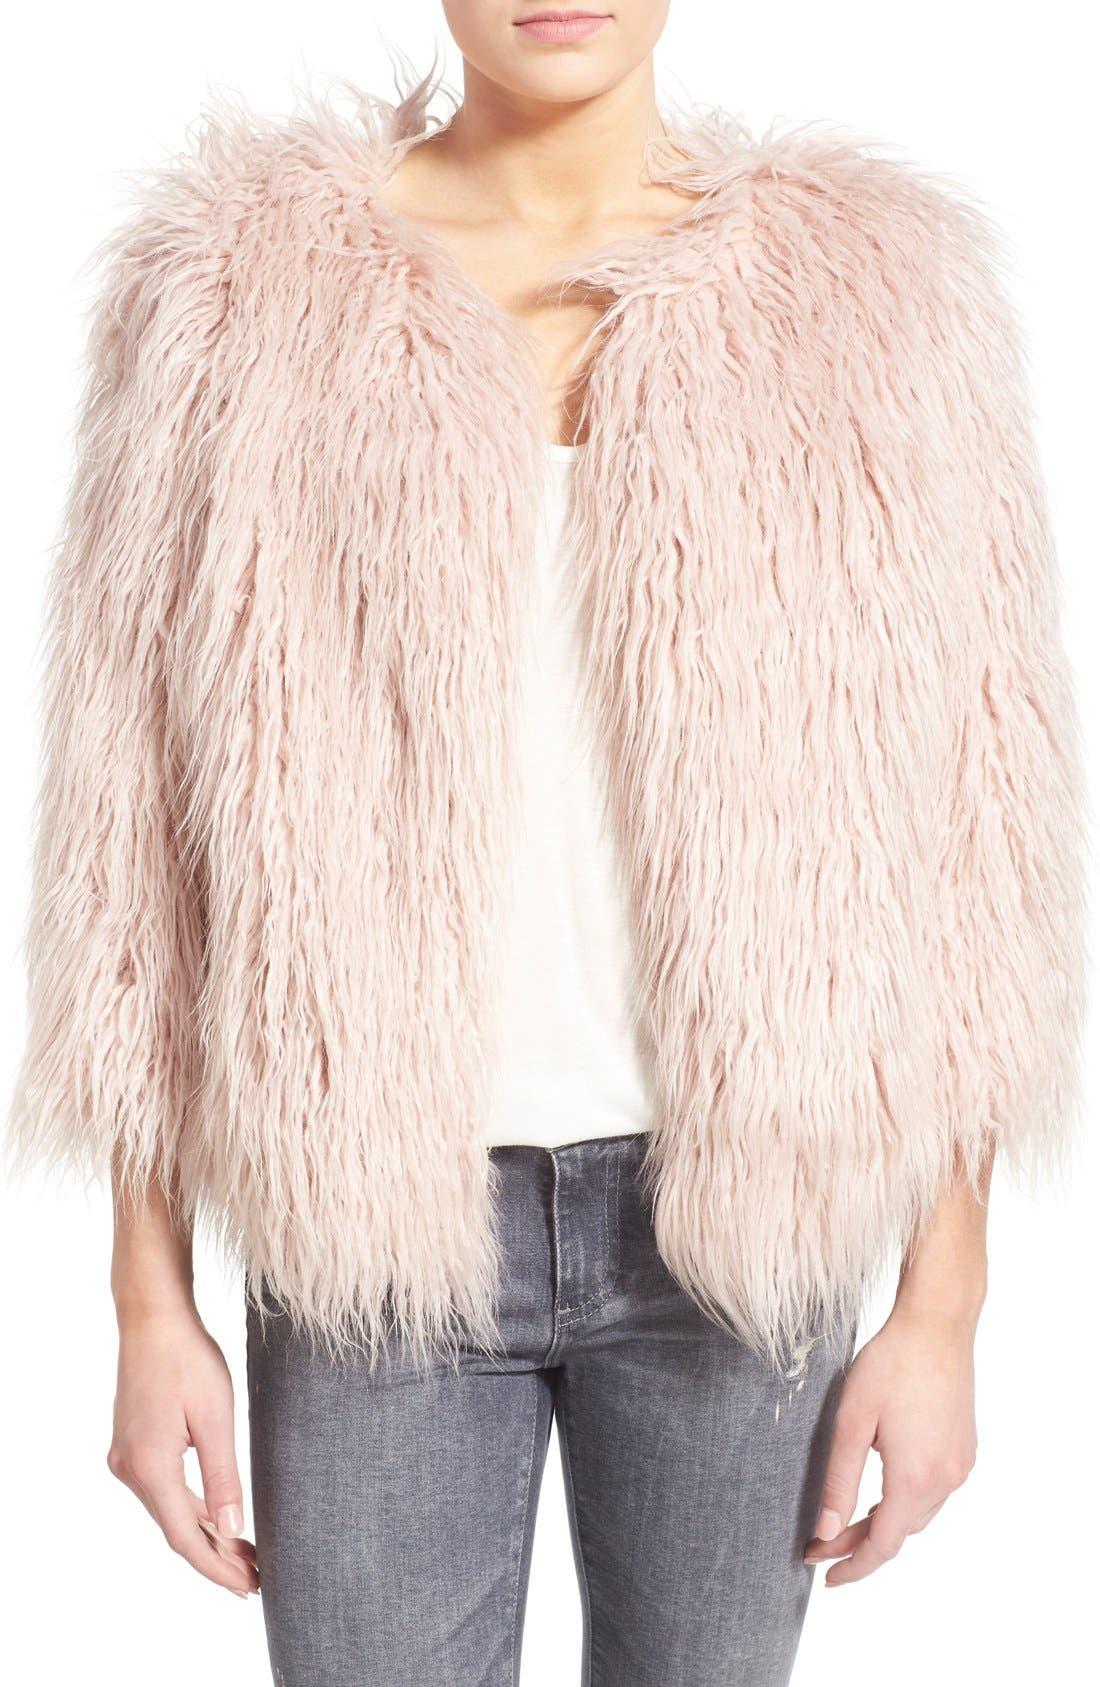 Main Image - Pam & Gela 'Mongolian' Faux Fur Coat